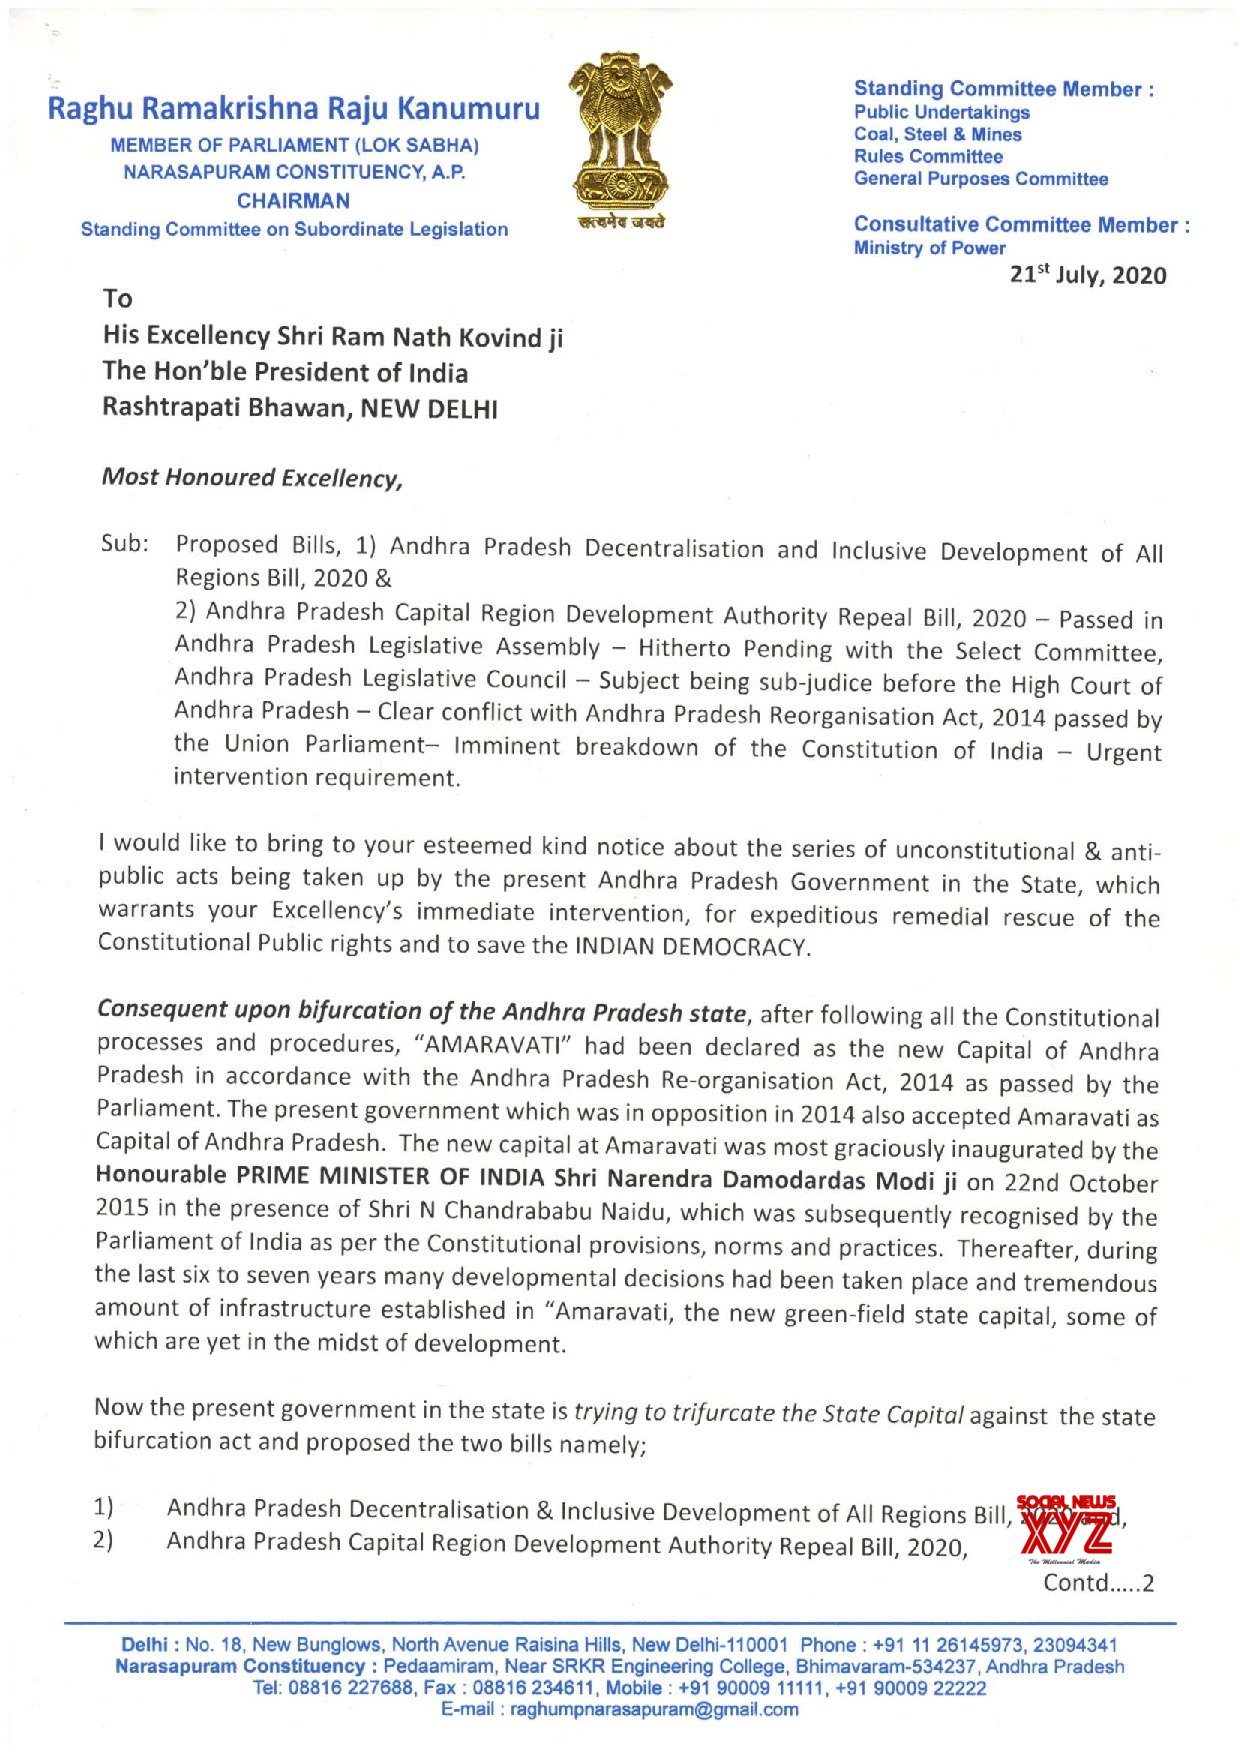 YSRCP MP K Raghu Rama Krishna Raju Memorandum To President Of India On Amaravati Capital Issue